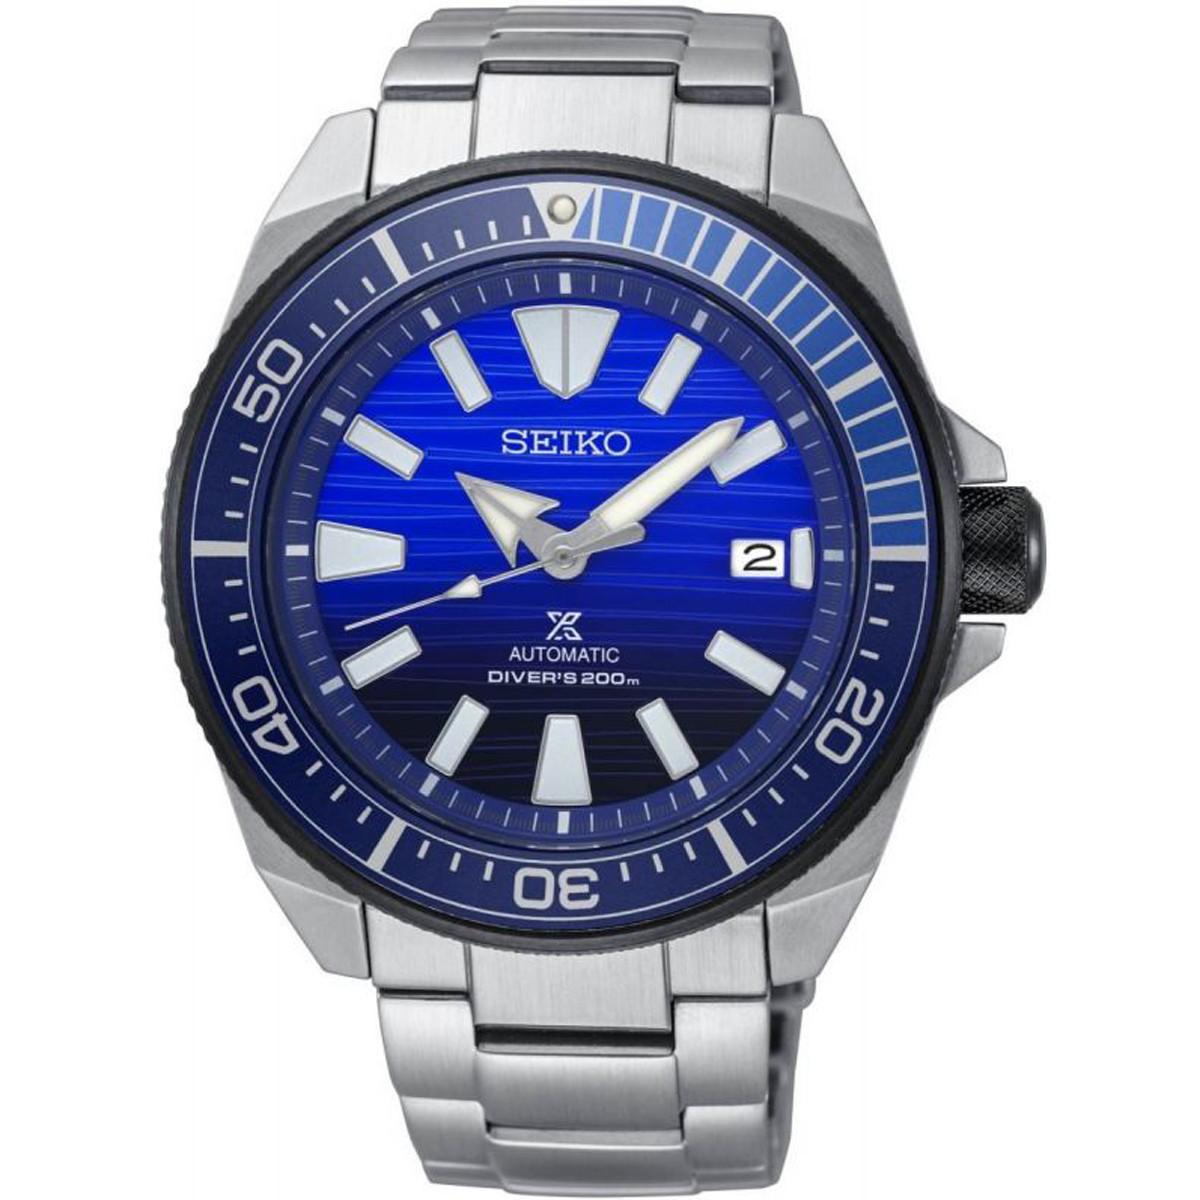 8d98d82aefe Seiko Prospex Samurai Save The Ocean Watch SRPC93K1